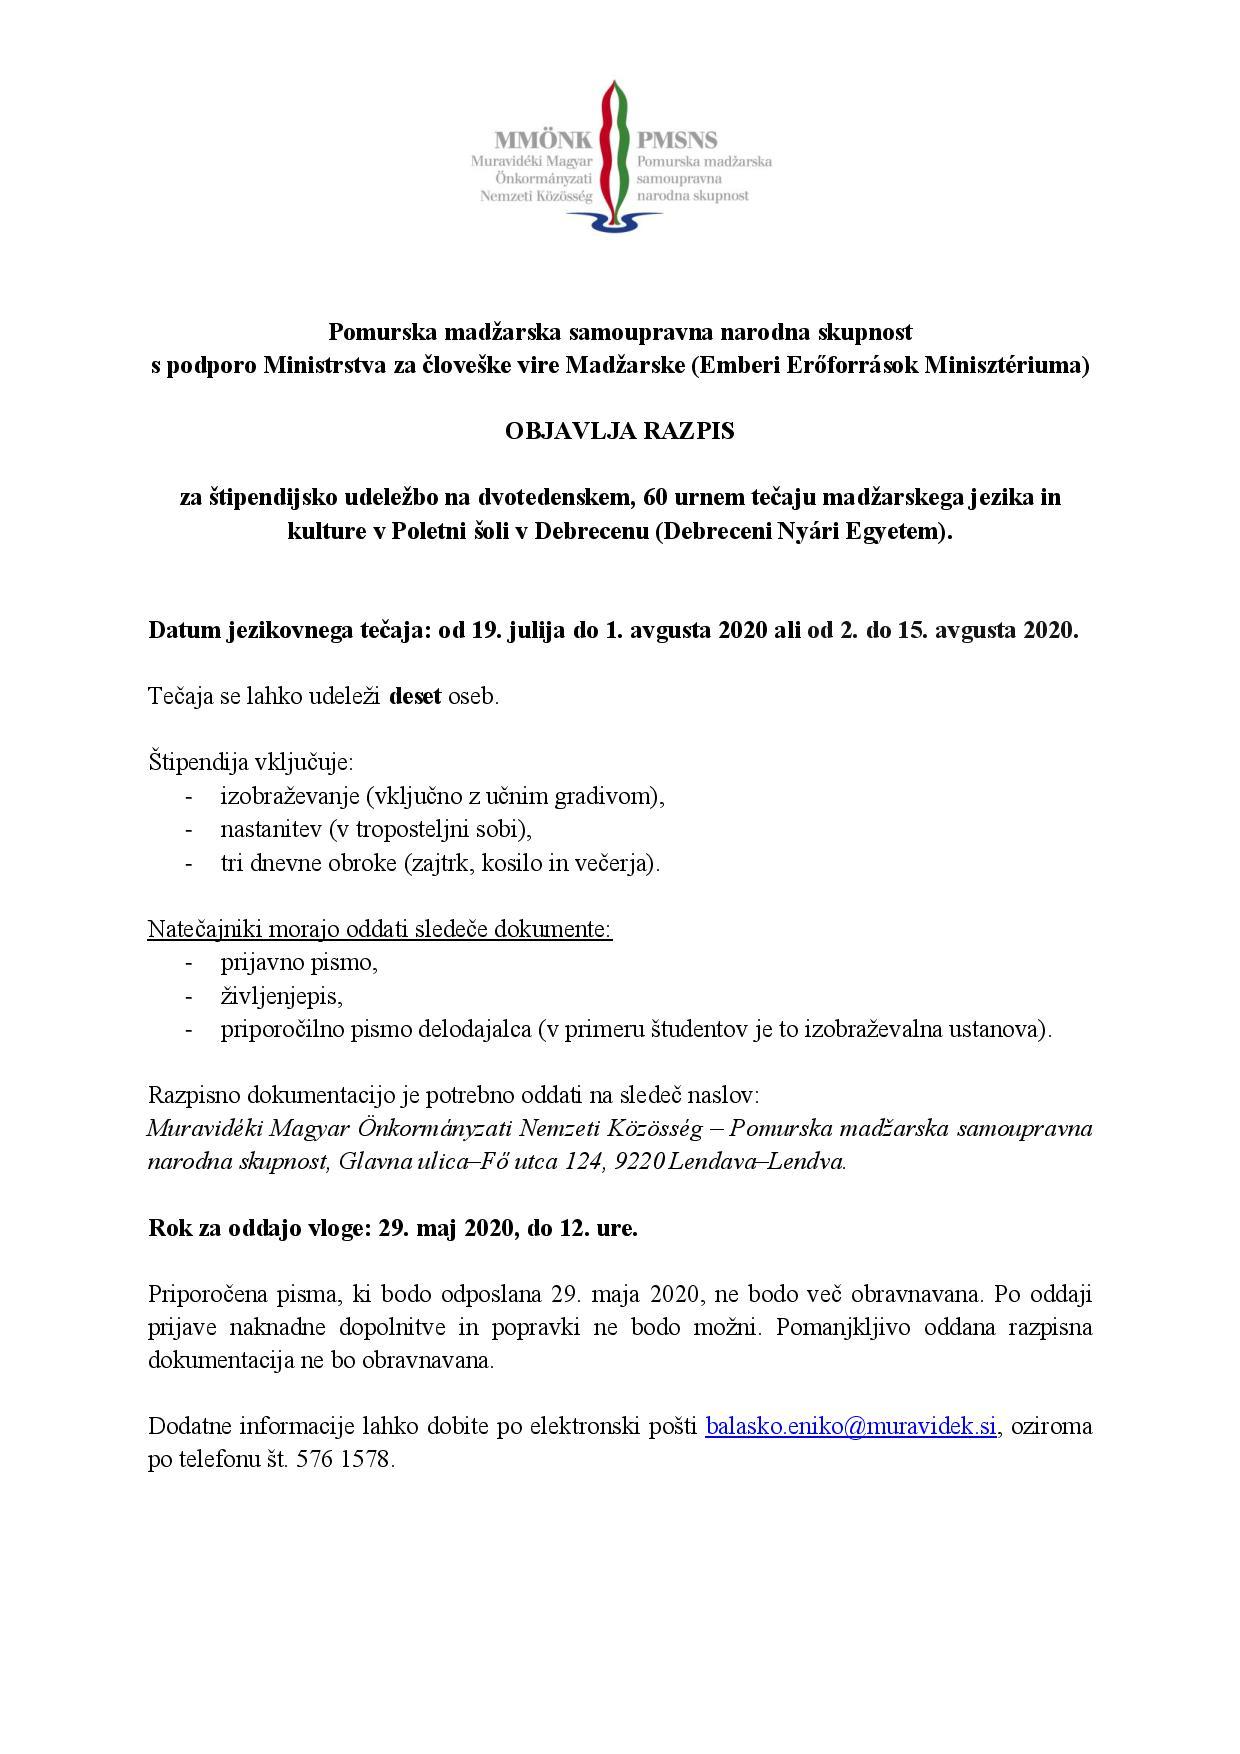 debreceni-nyari-egyetem_2020_palyazat_ketnyelvu_si-page-001